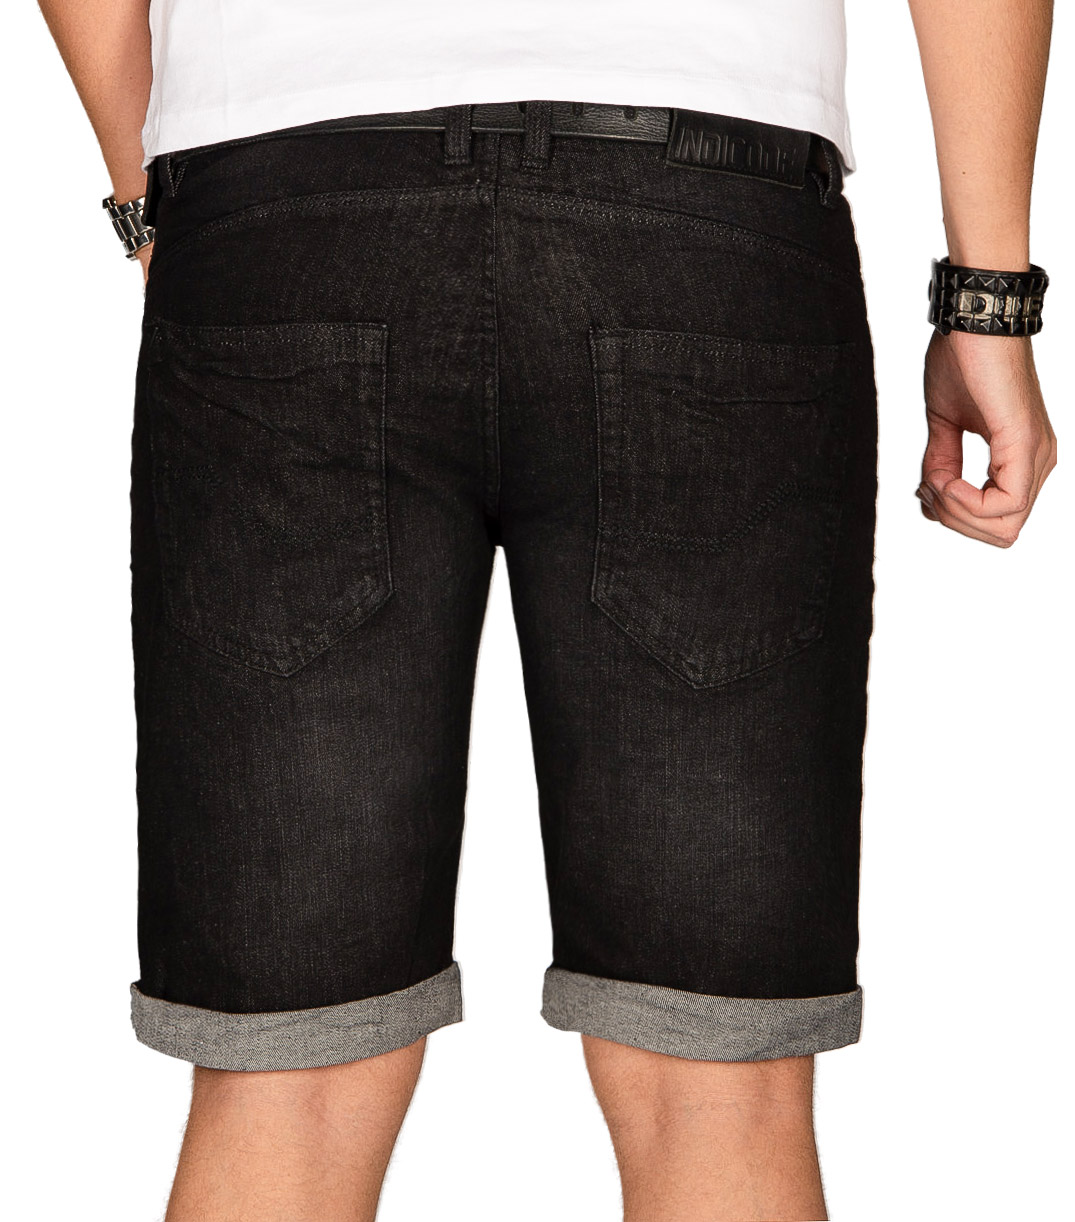 Indicode-Herren-Sommer-Bermuda-Jeans-Shorts-kurze-Hose-Sommerhose-Short-Neu-B556 Indexbild 5